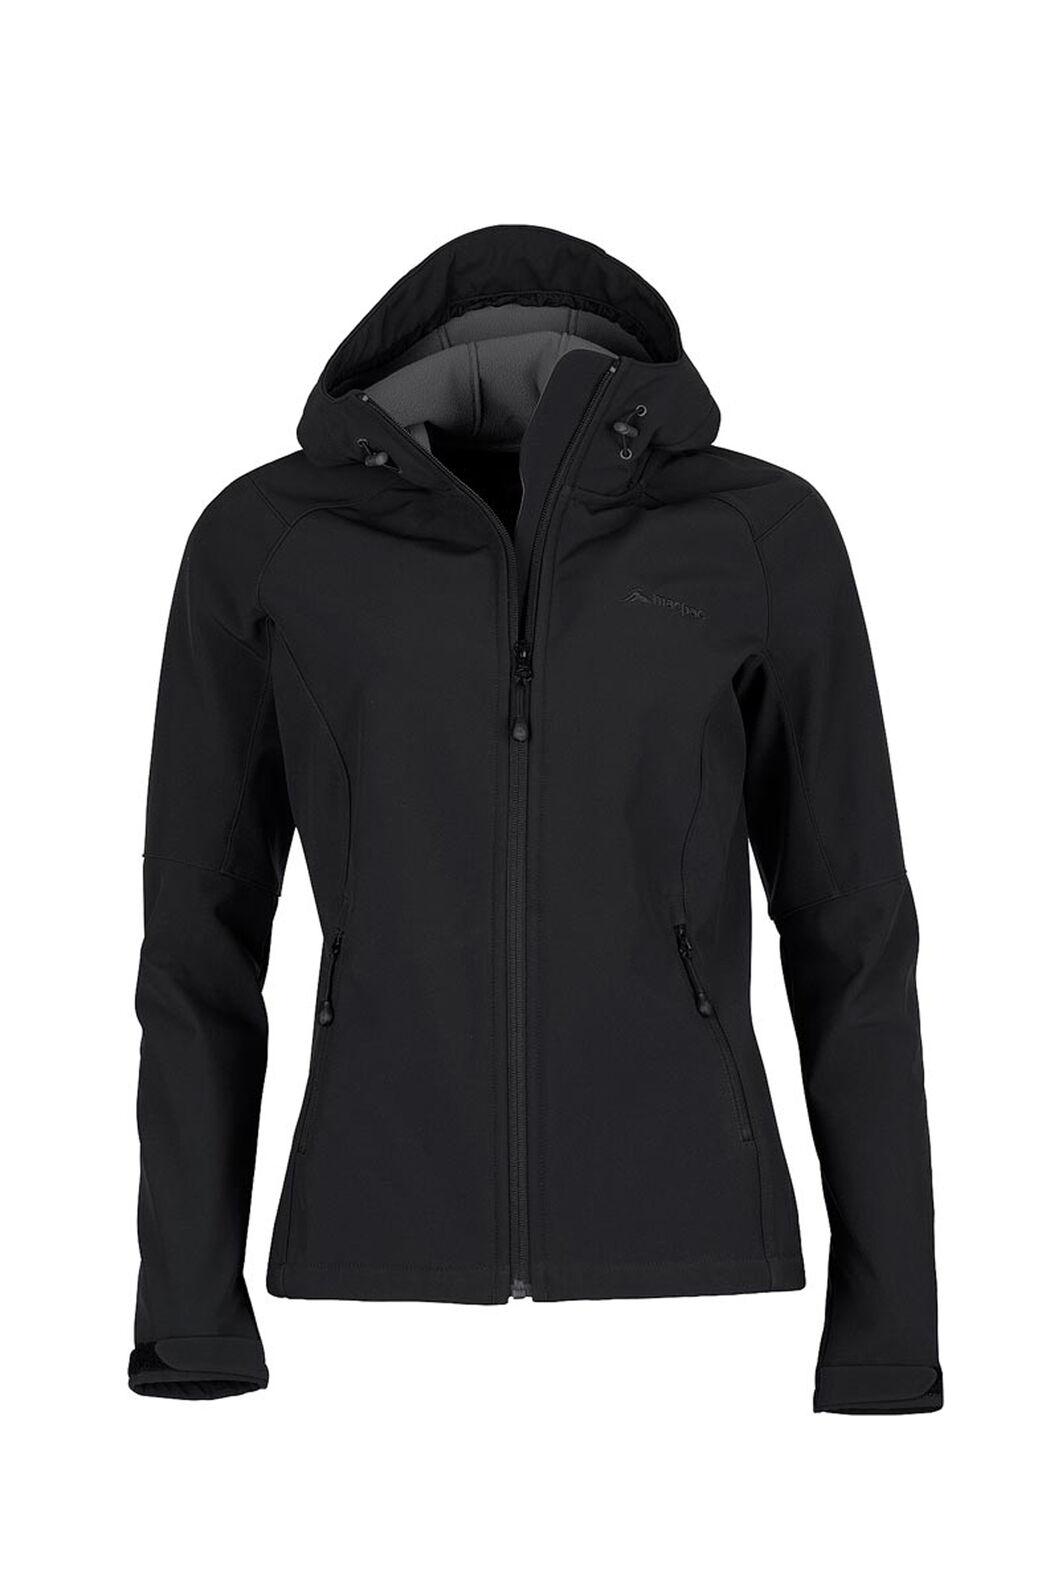 Macpac Sabre Hooded Softshell Jacket - Women's, Black, hi-res